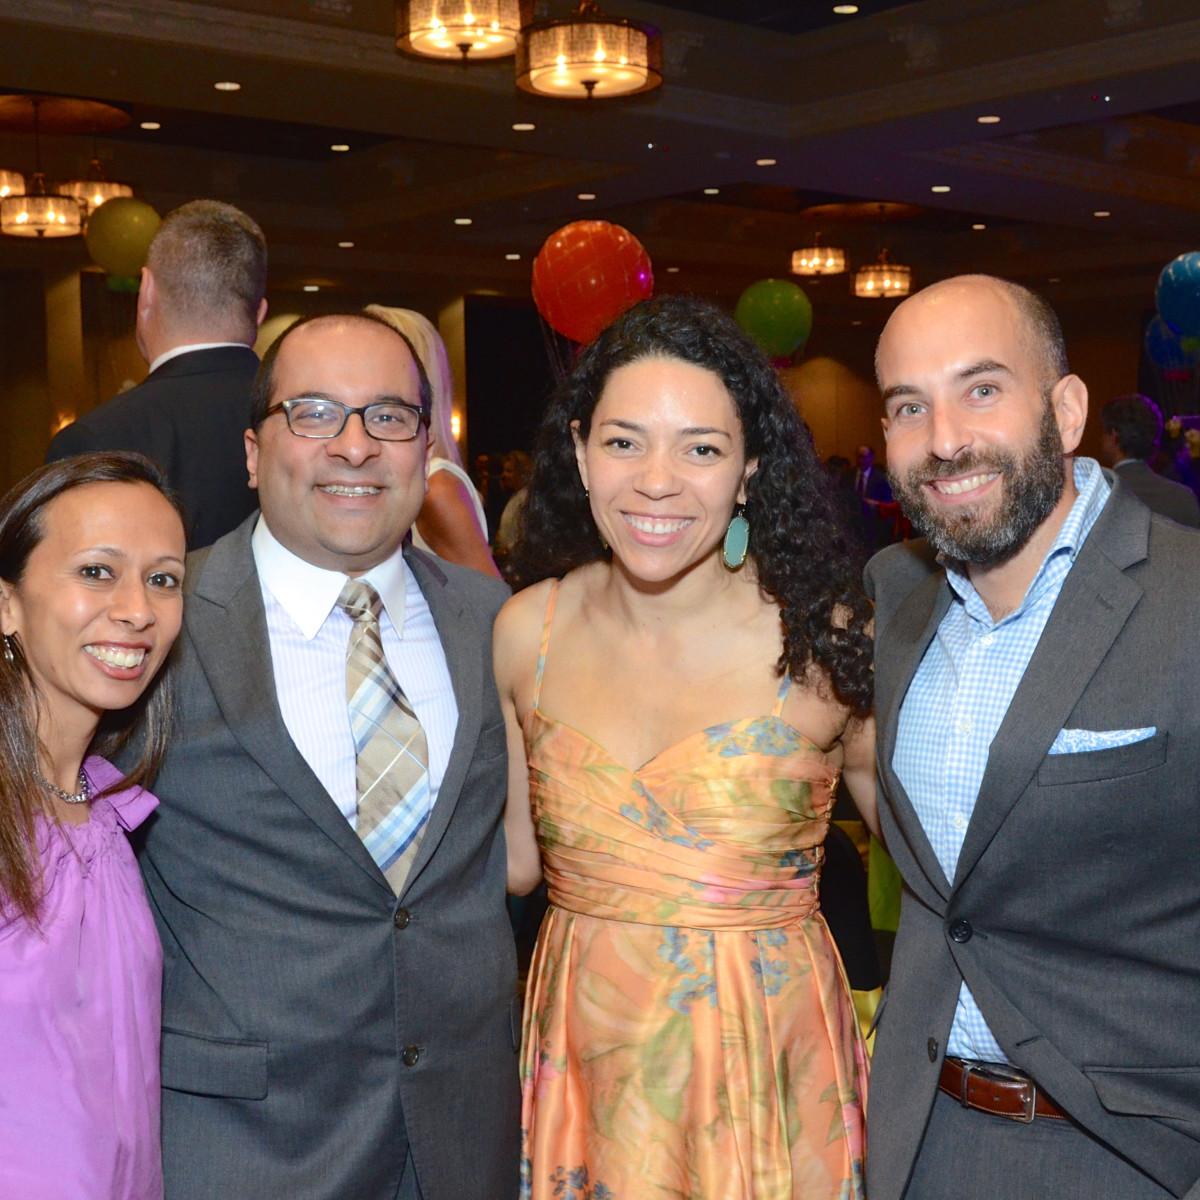 KIPP Houston dinner 4/16,Sehba Ali, Shehz Ali, Erica Dibella, MarkDiBella